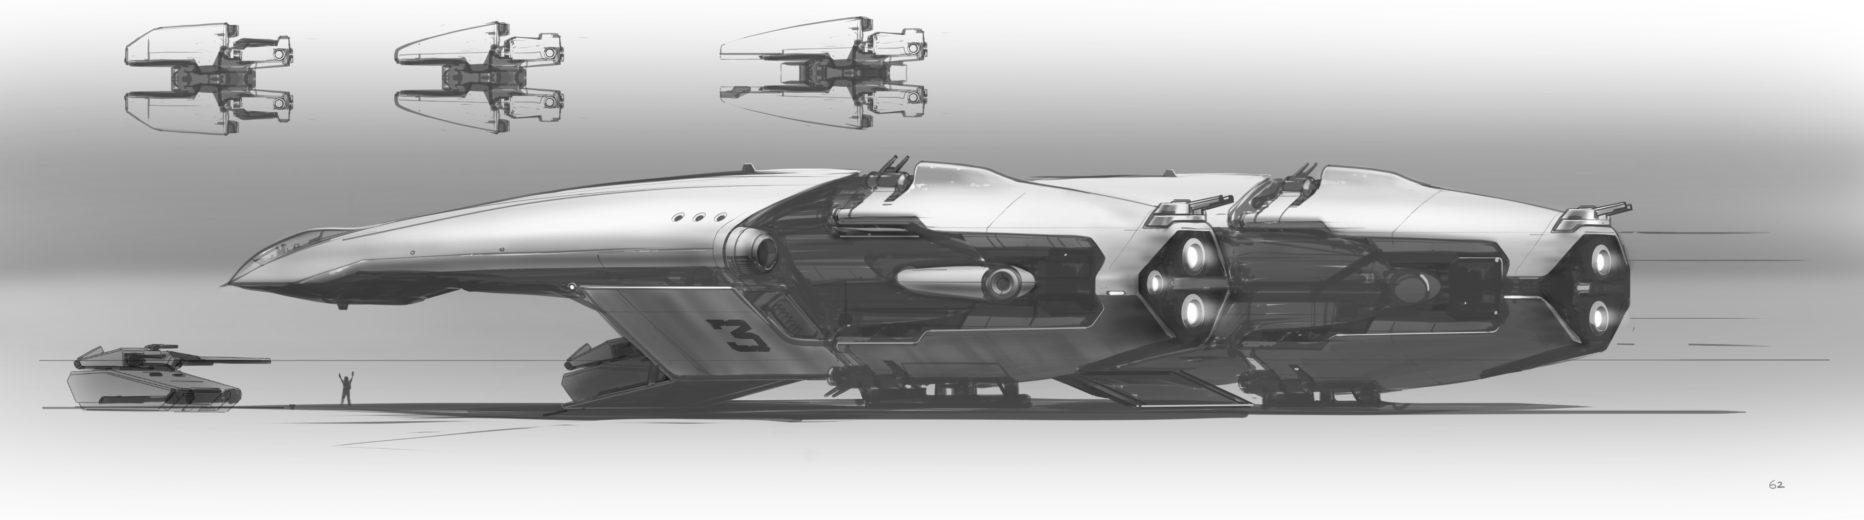 SC-Hercules-Concept-Art-7.jpg